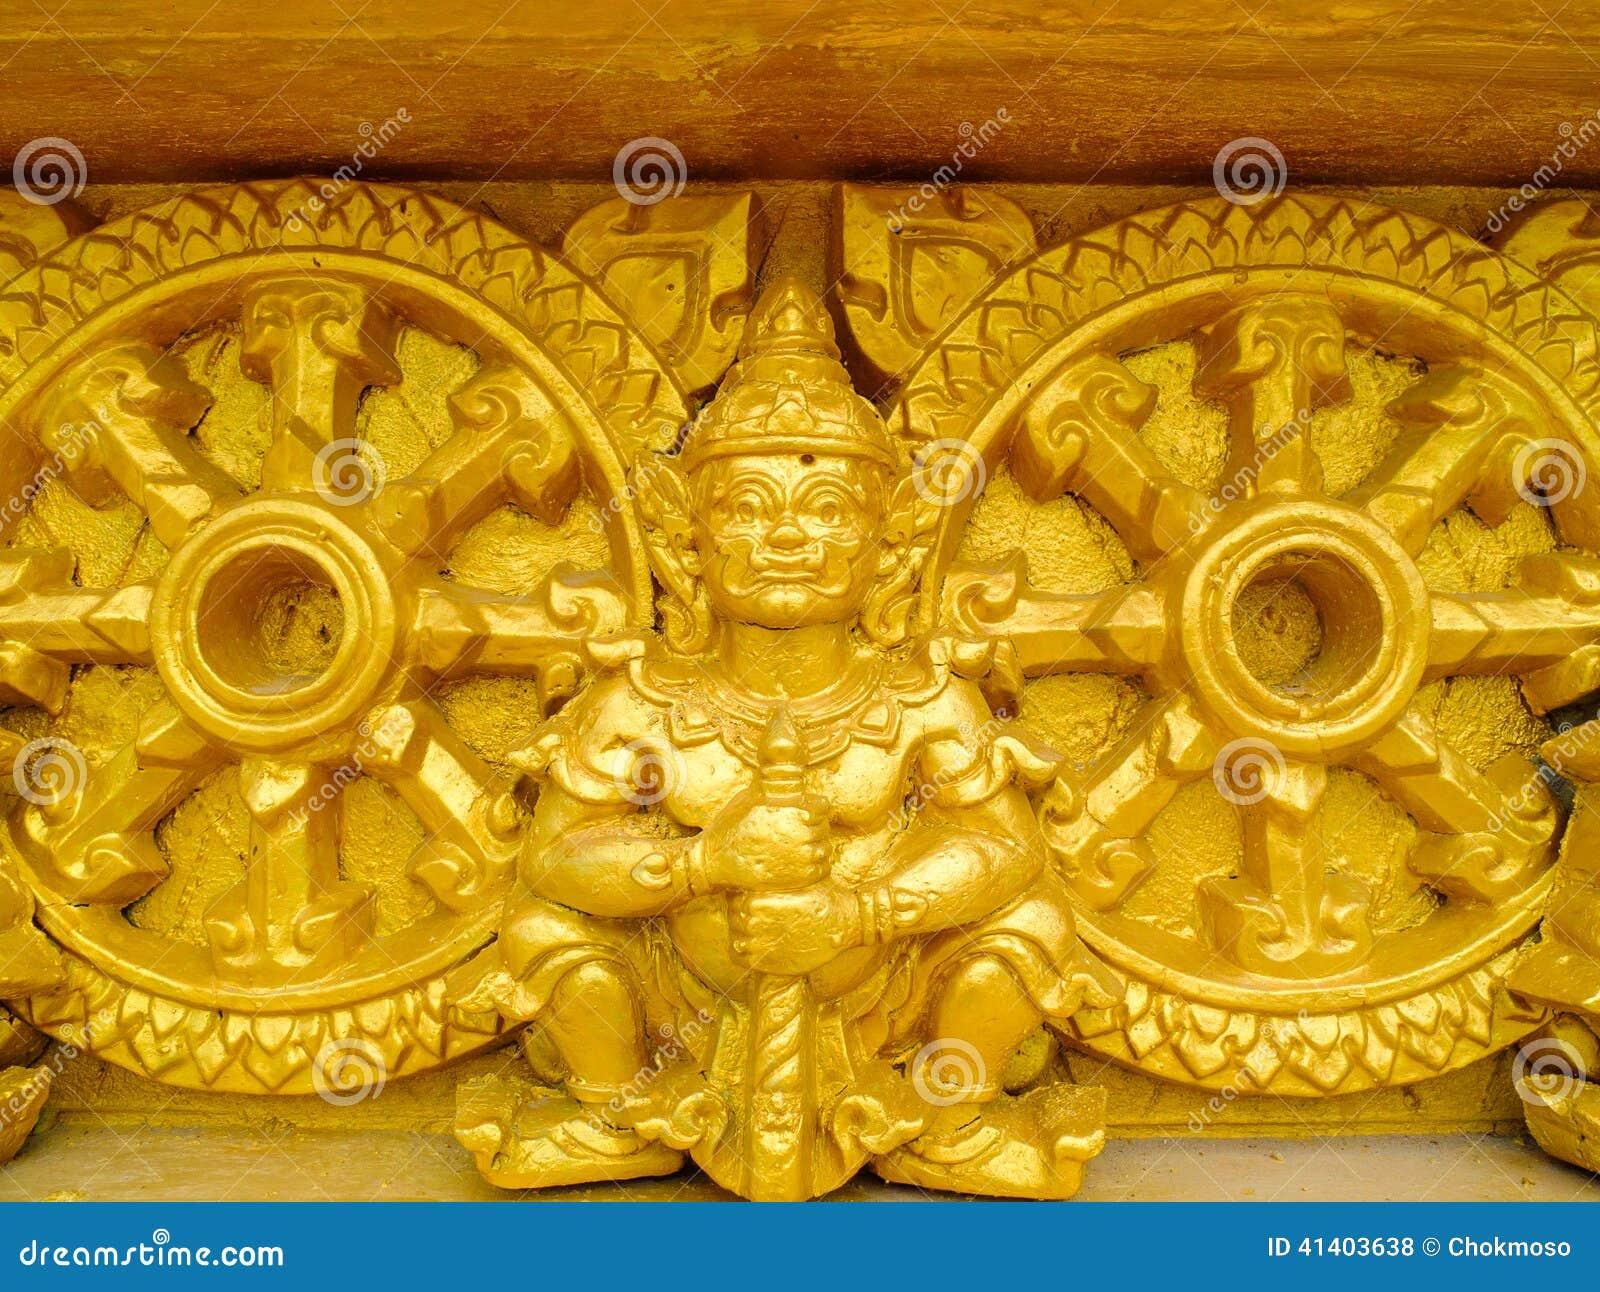 Riesige goldene Skulptur